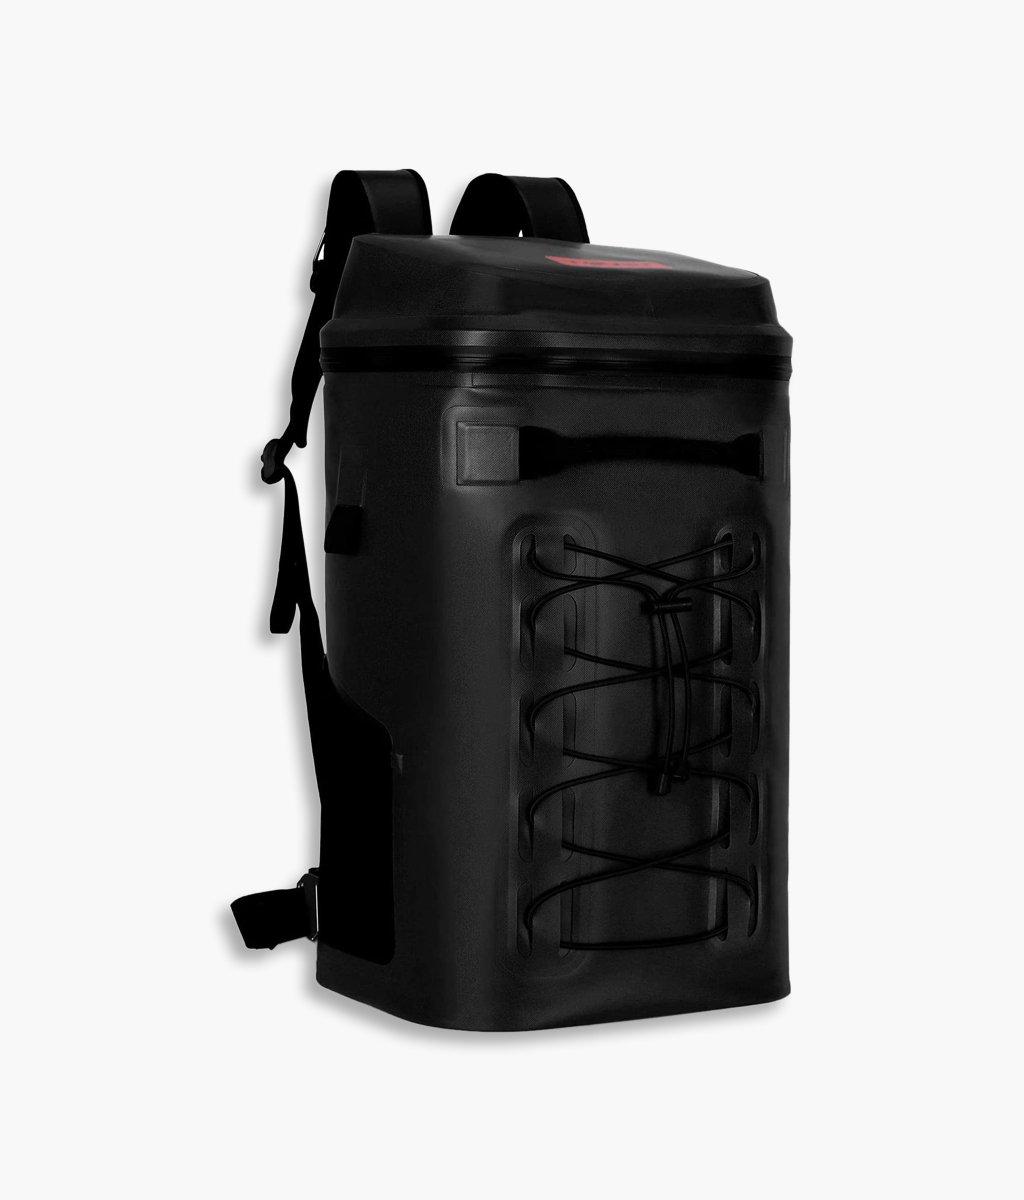 Cooler Backpack Waterproof Insulated Leak-proof